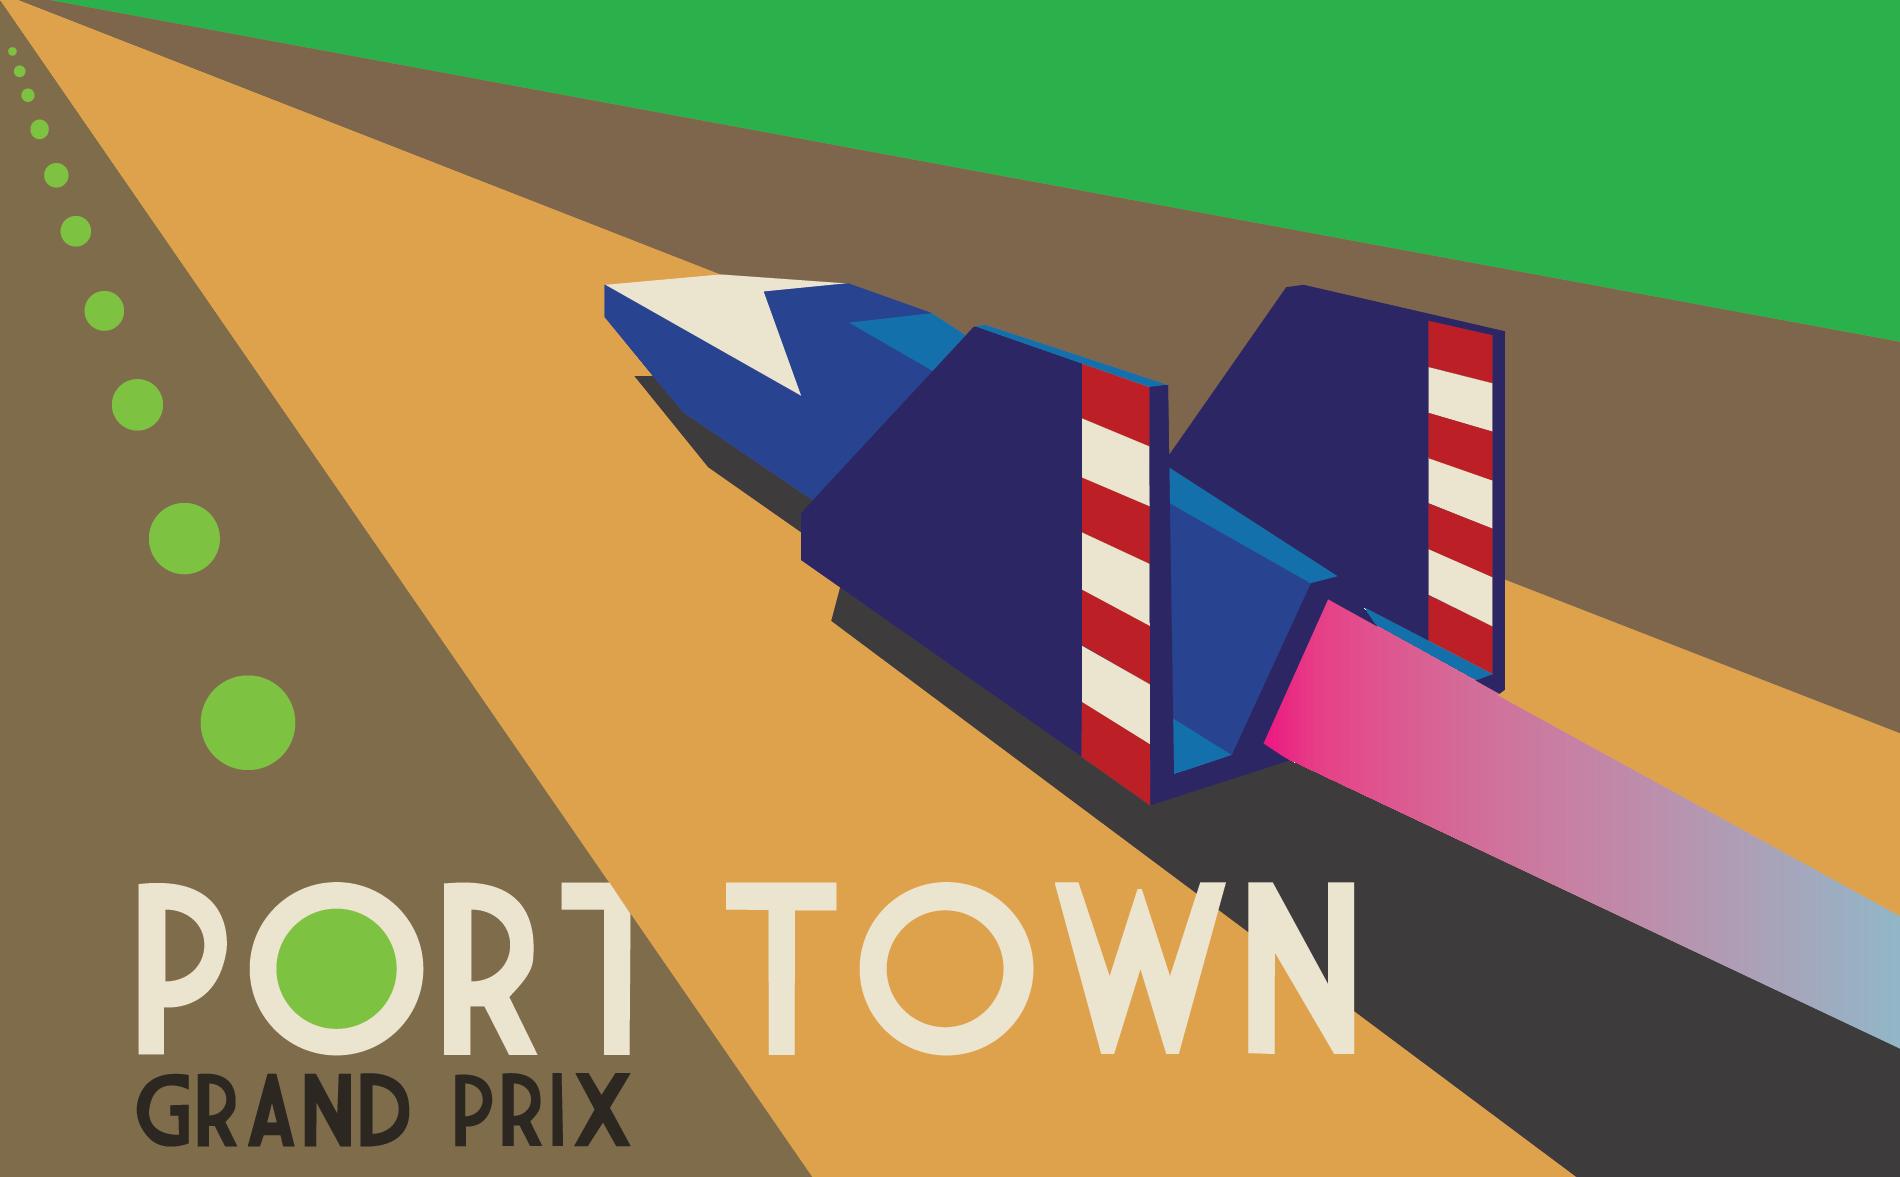 IGN F-Zero Blue Falcon Poster - image 1 - student project